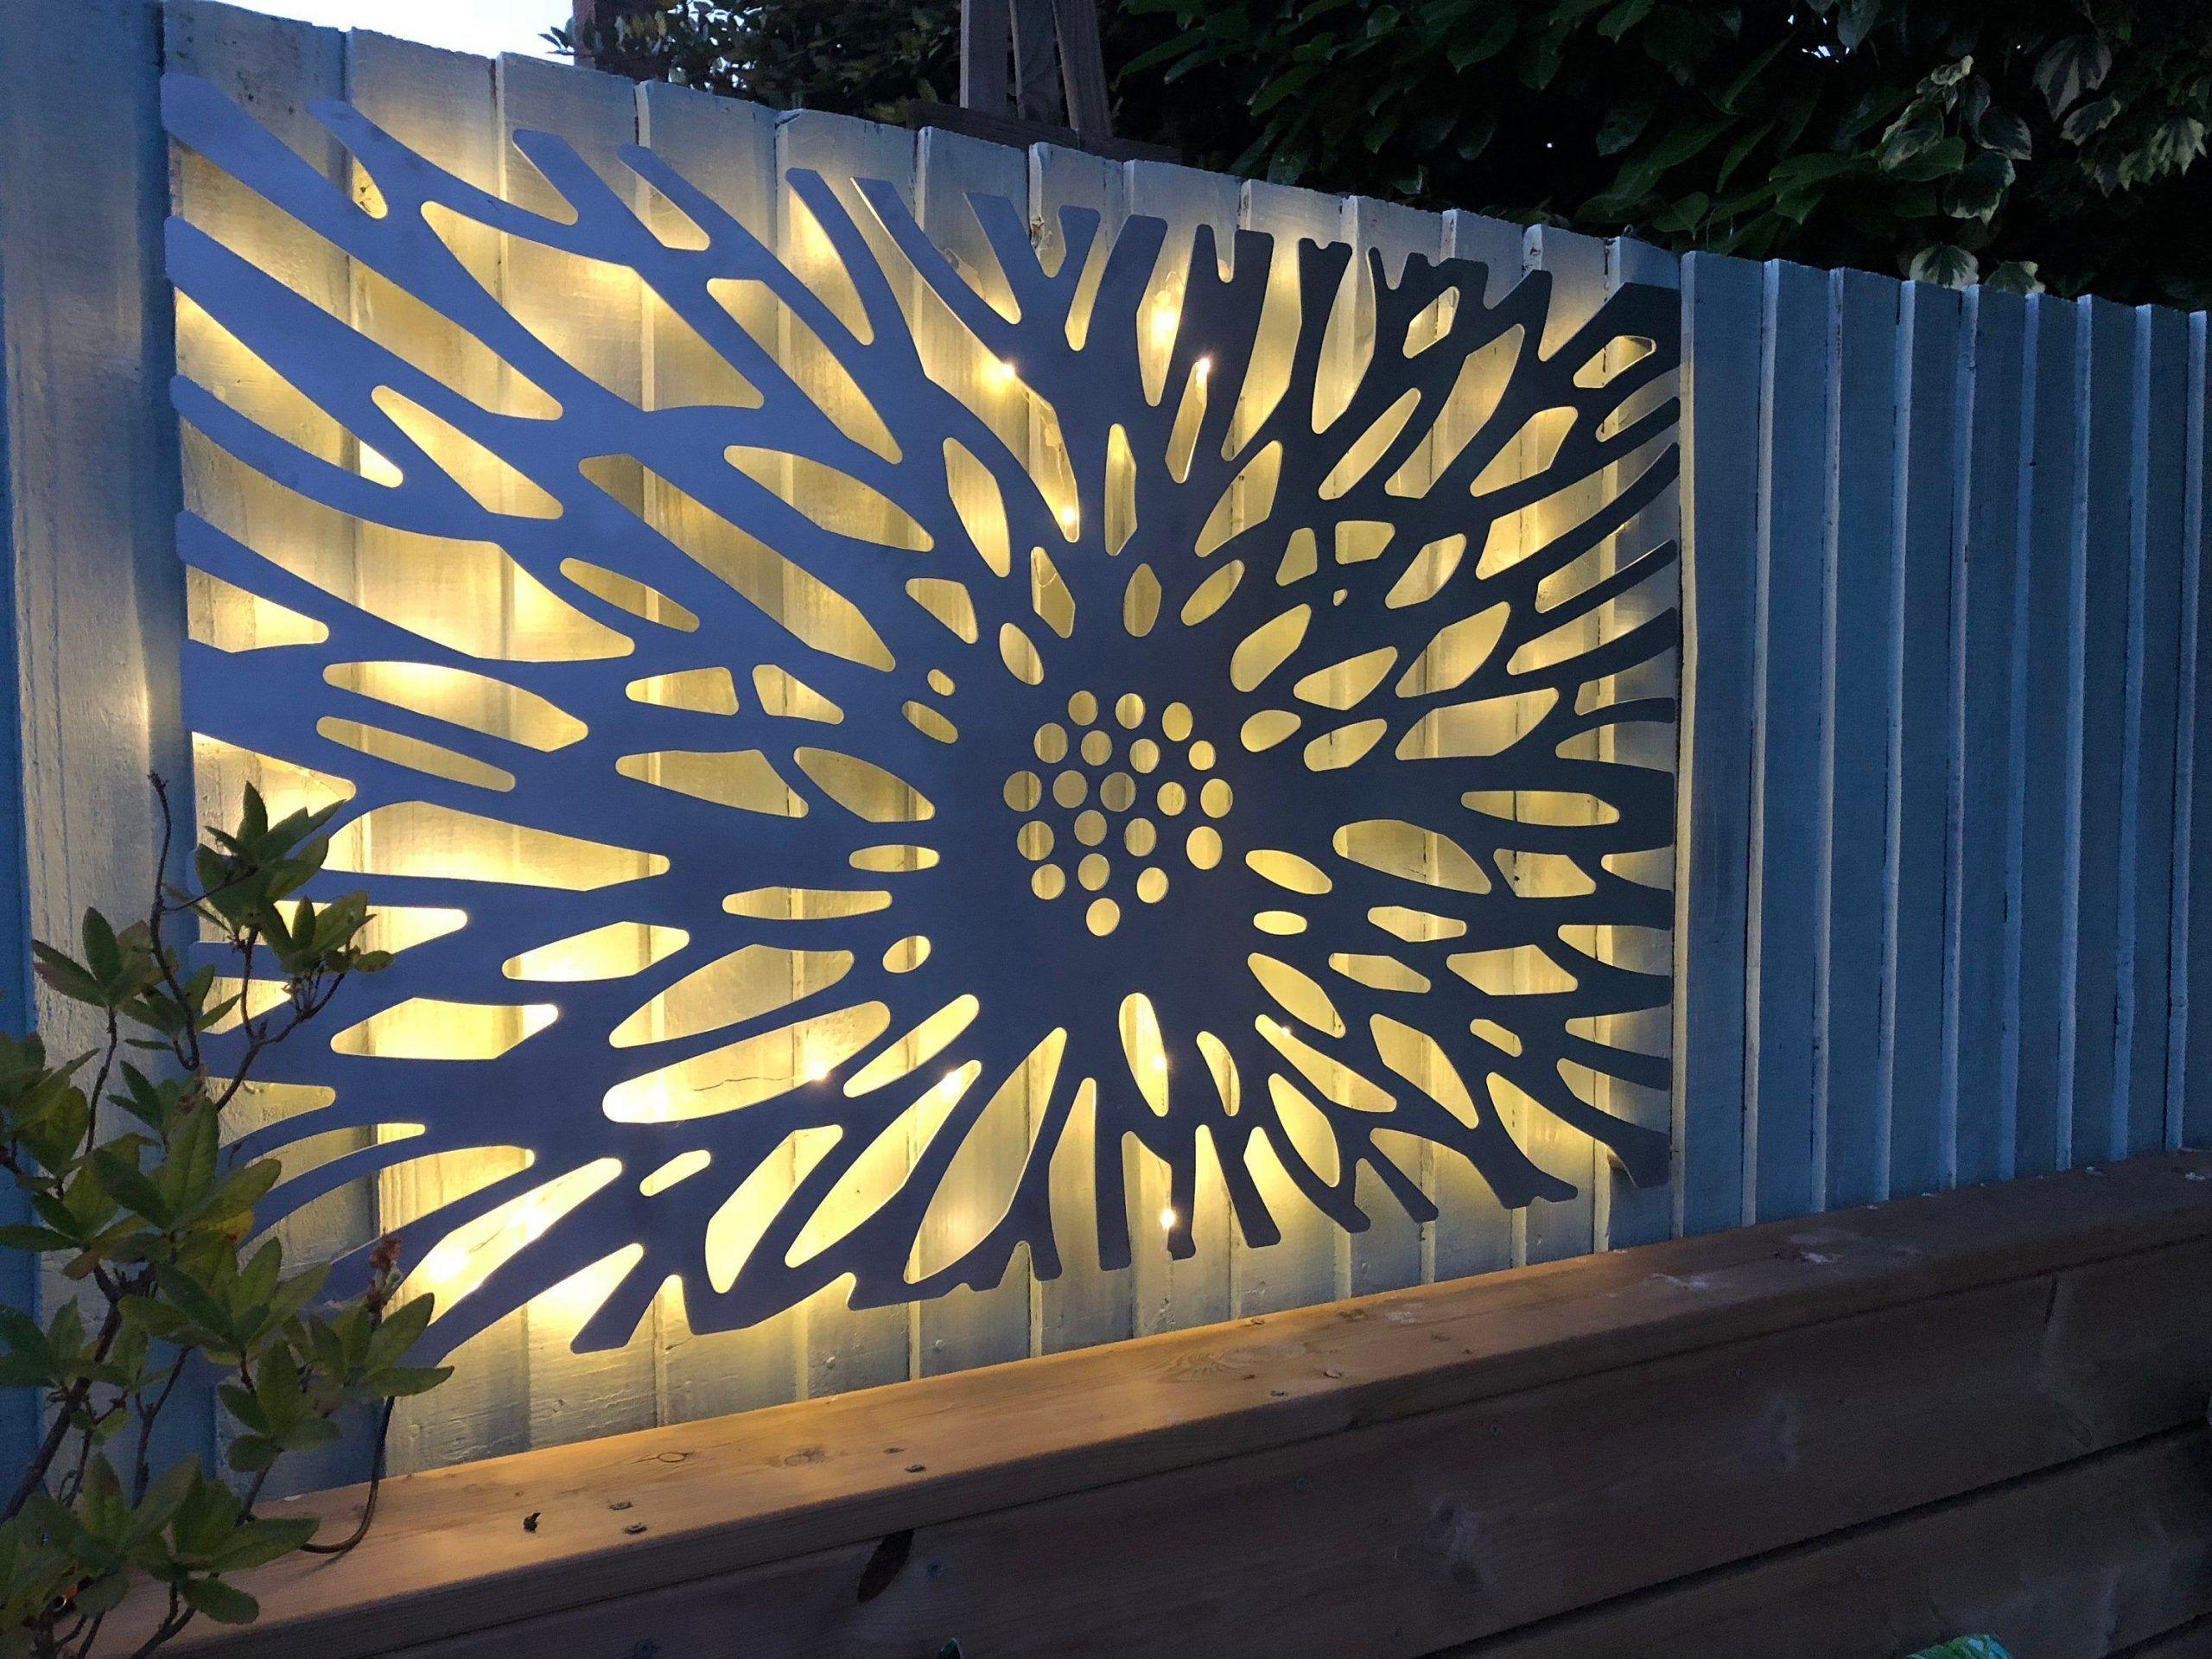 Lasergeschnittene Dekorative Metallwandkunstplatte Gartenwandskulptur Dekoration P Lasergeschni Garden Wall Designs Outdoor Wall Art Garden Wall Art